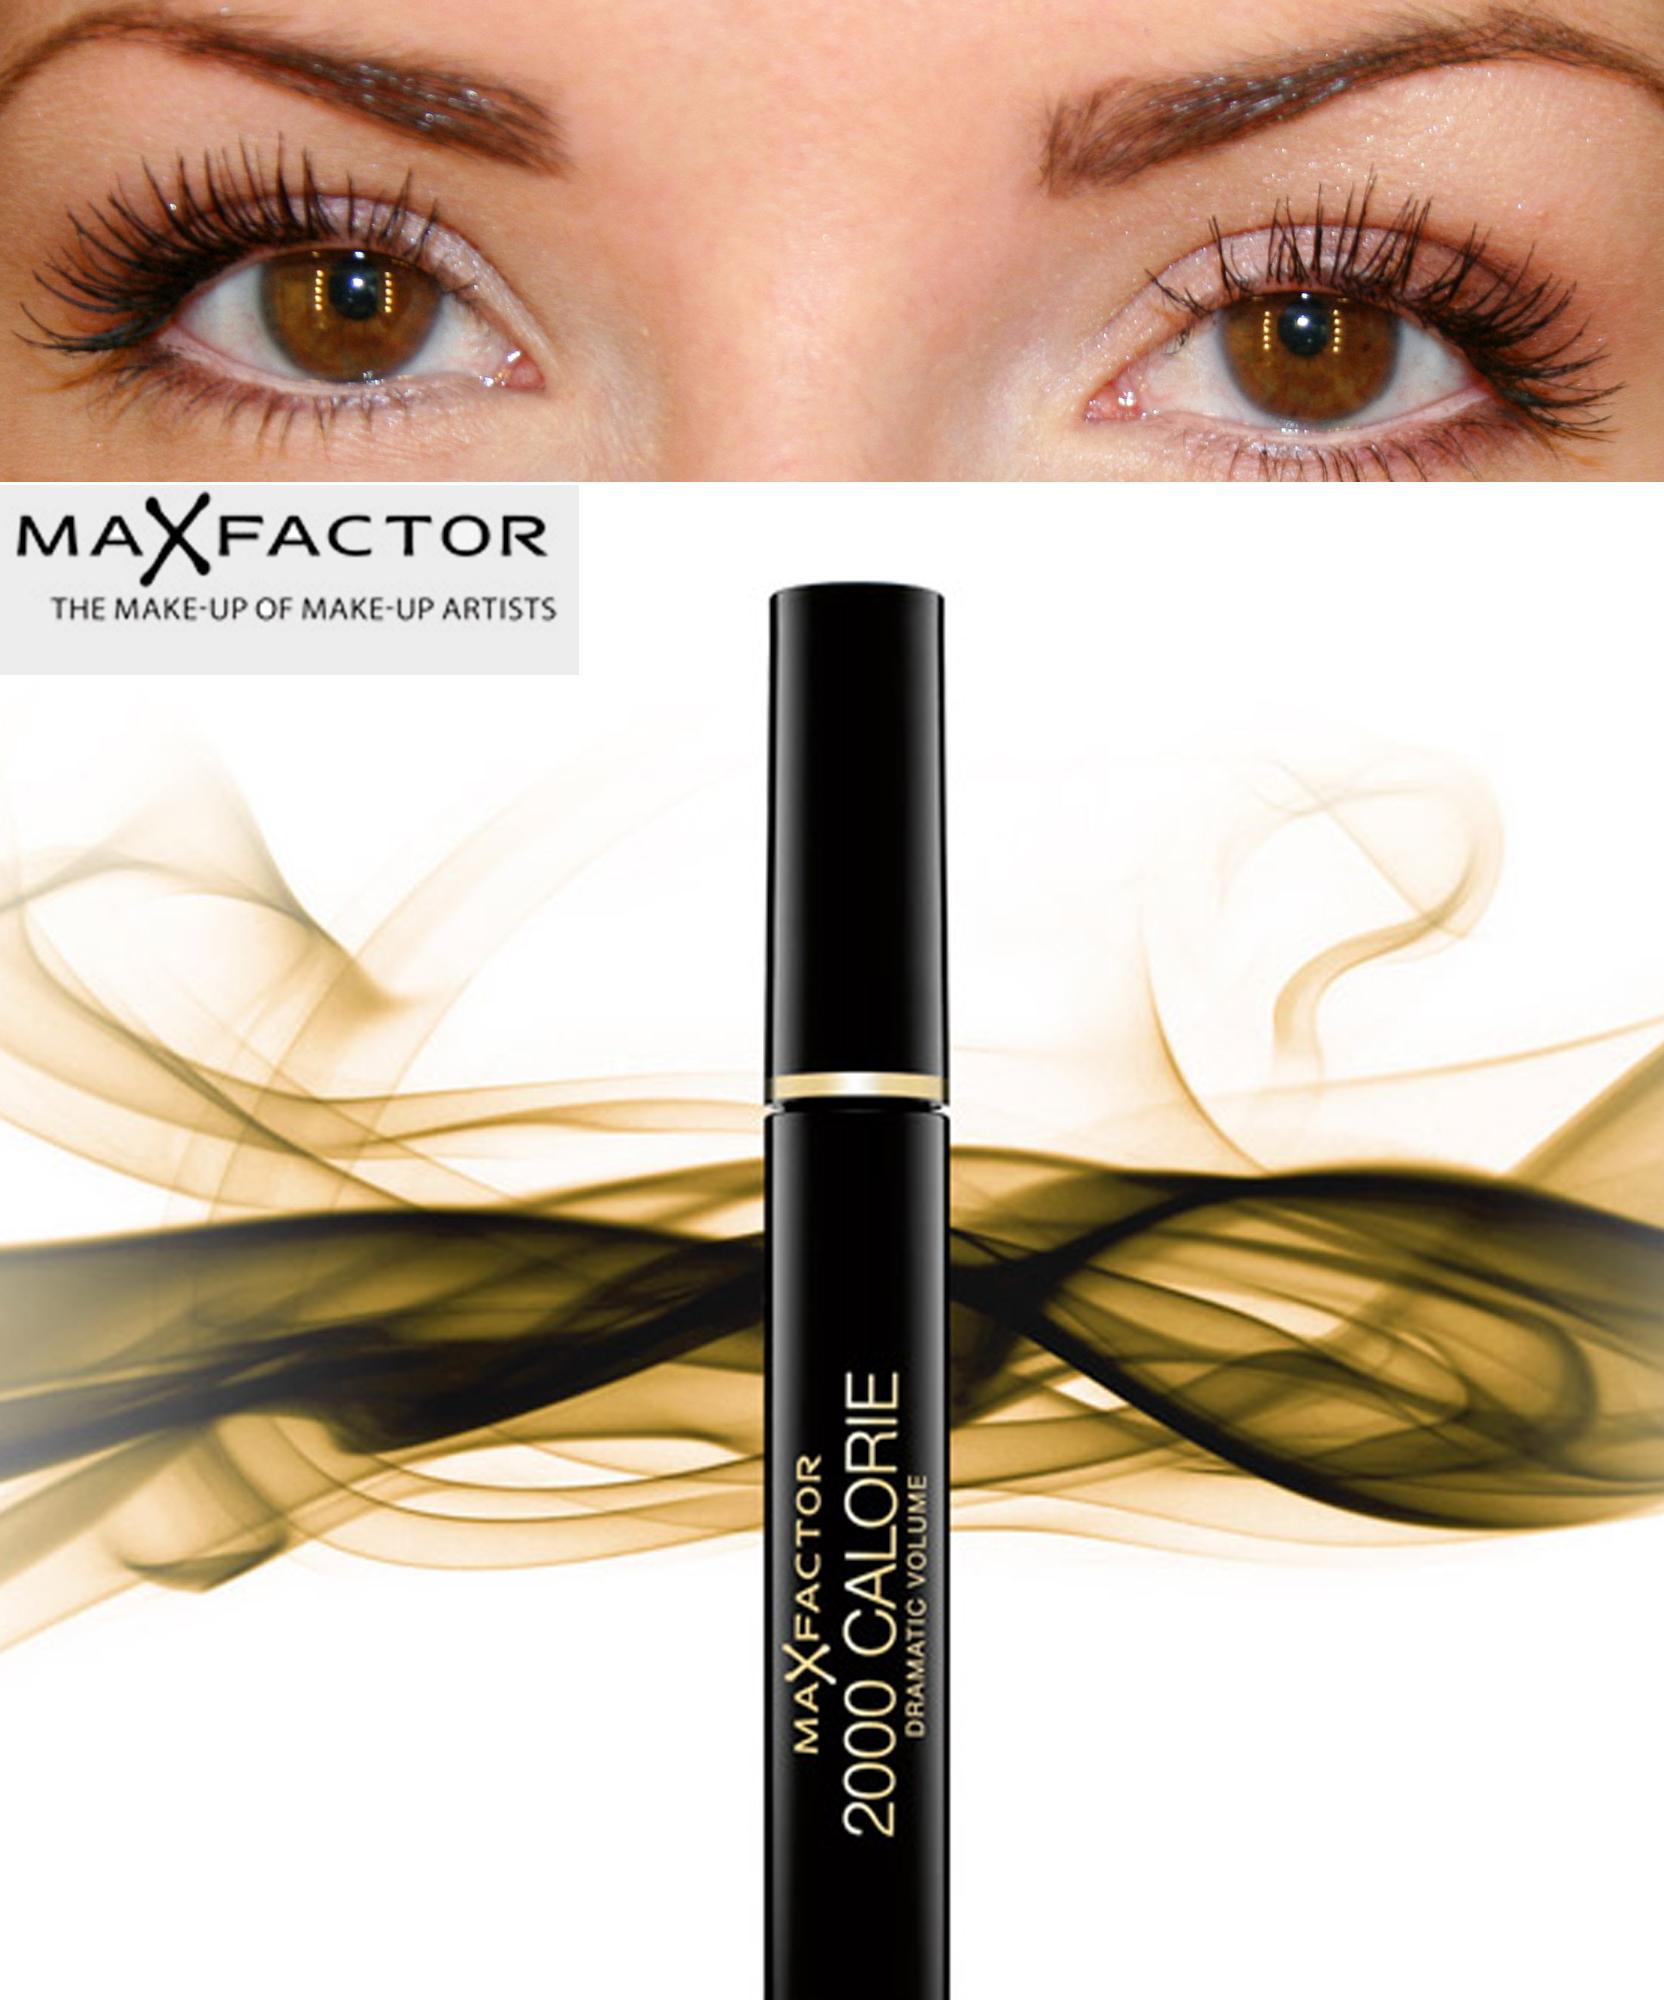 MaxFactorCalorie2000DramaticVolume Mascara - BlackBrown